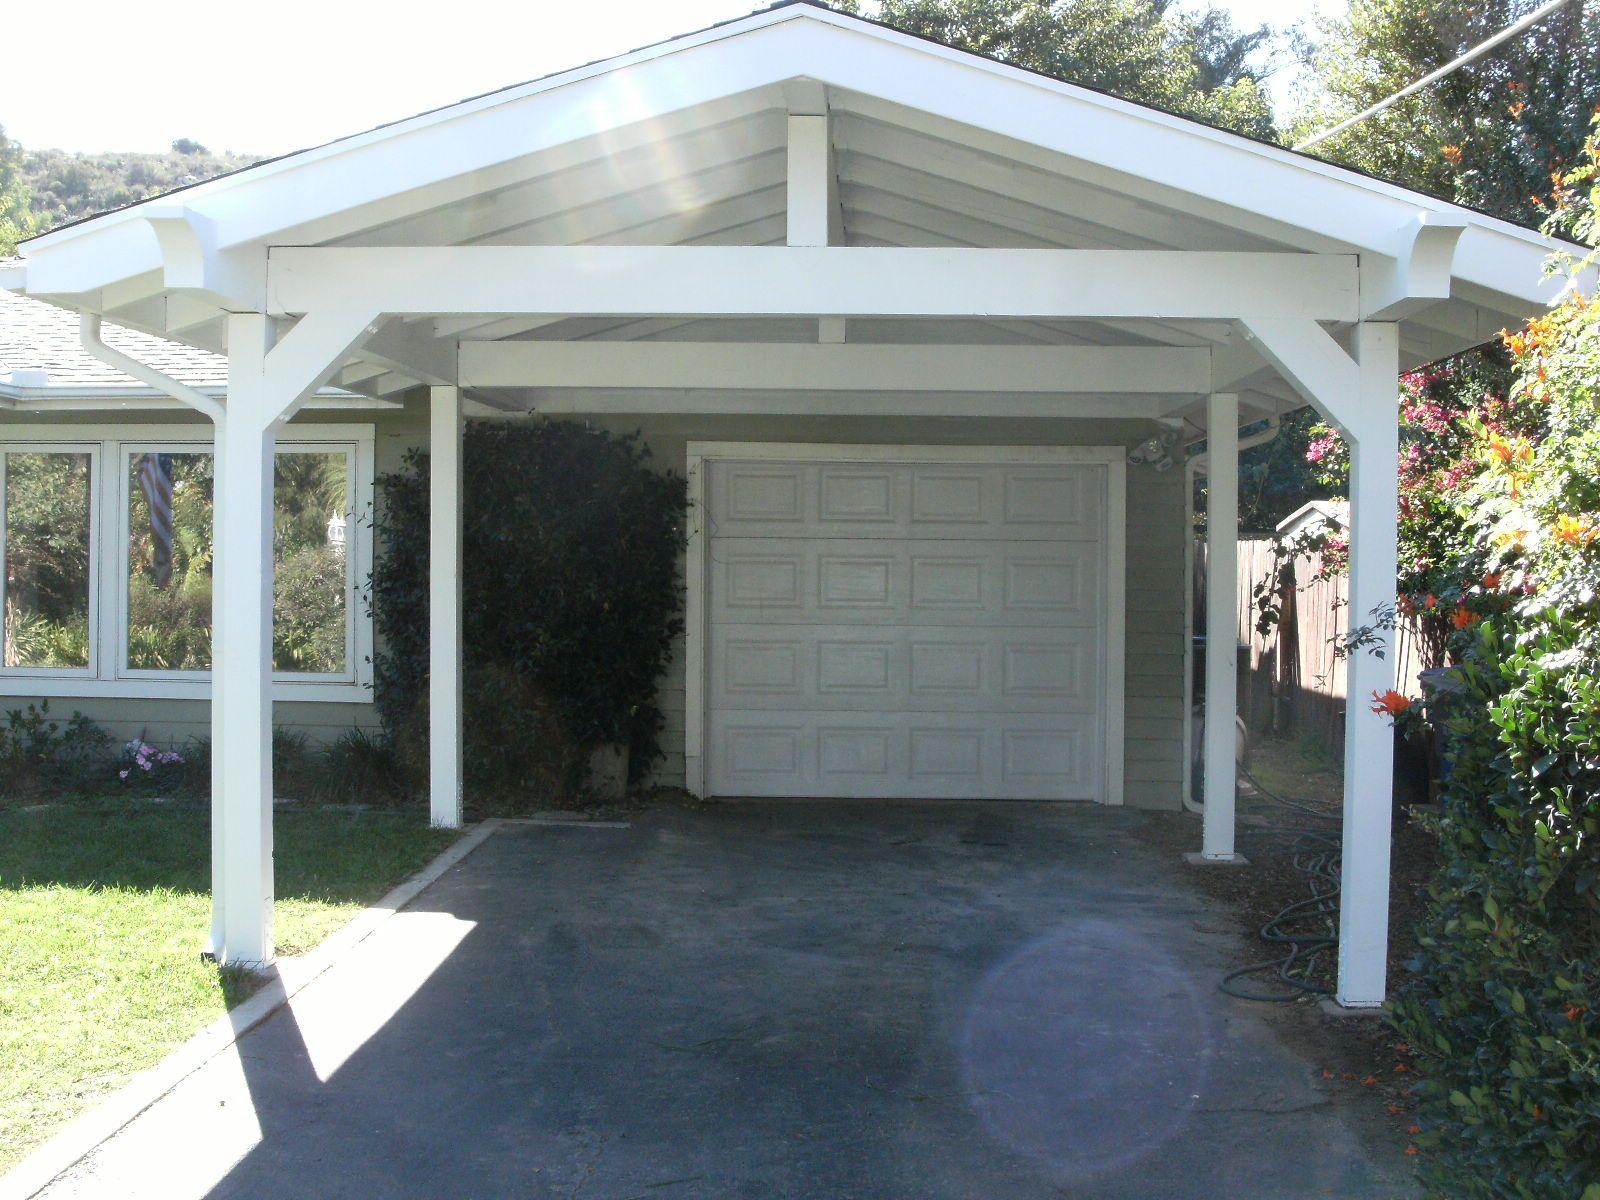 Pitched Roof Carport Adding Onto The Single Garage Carport